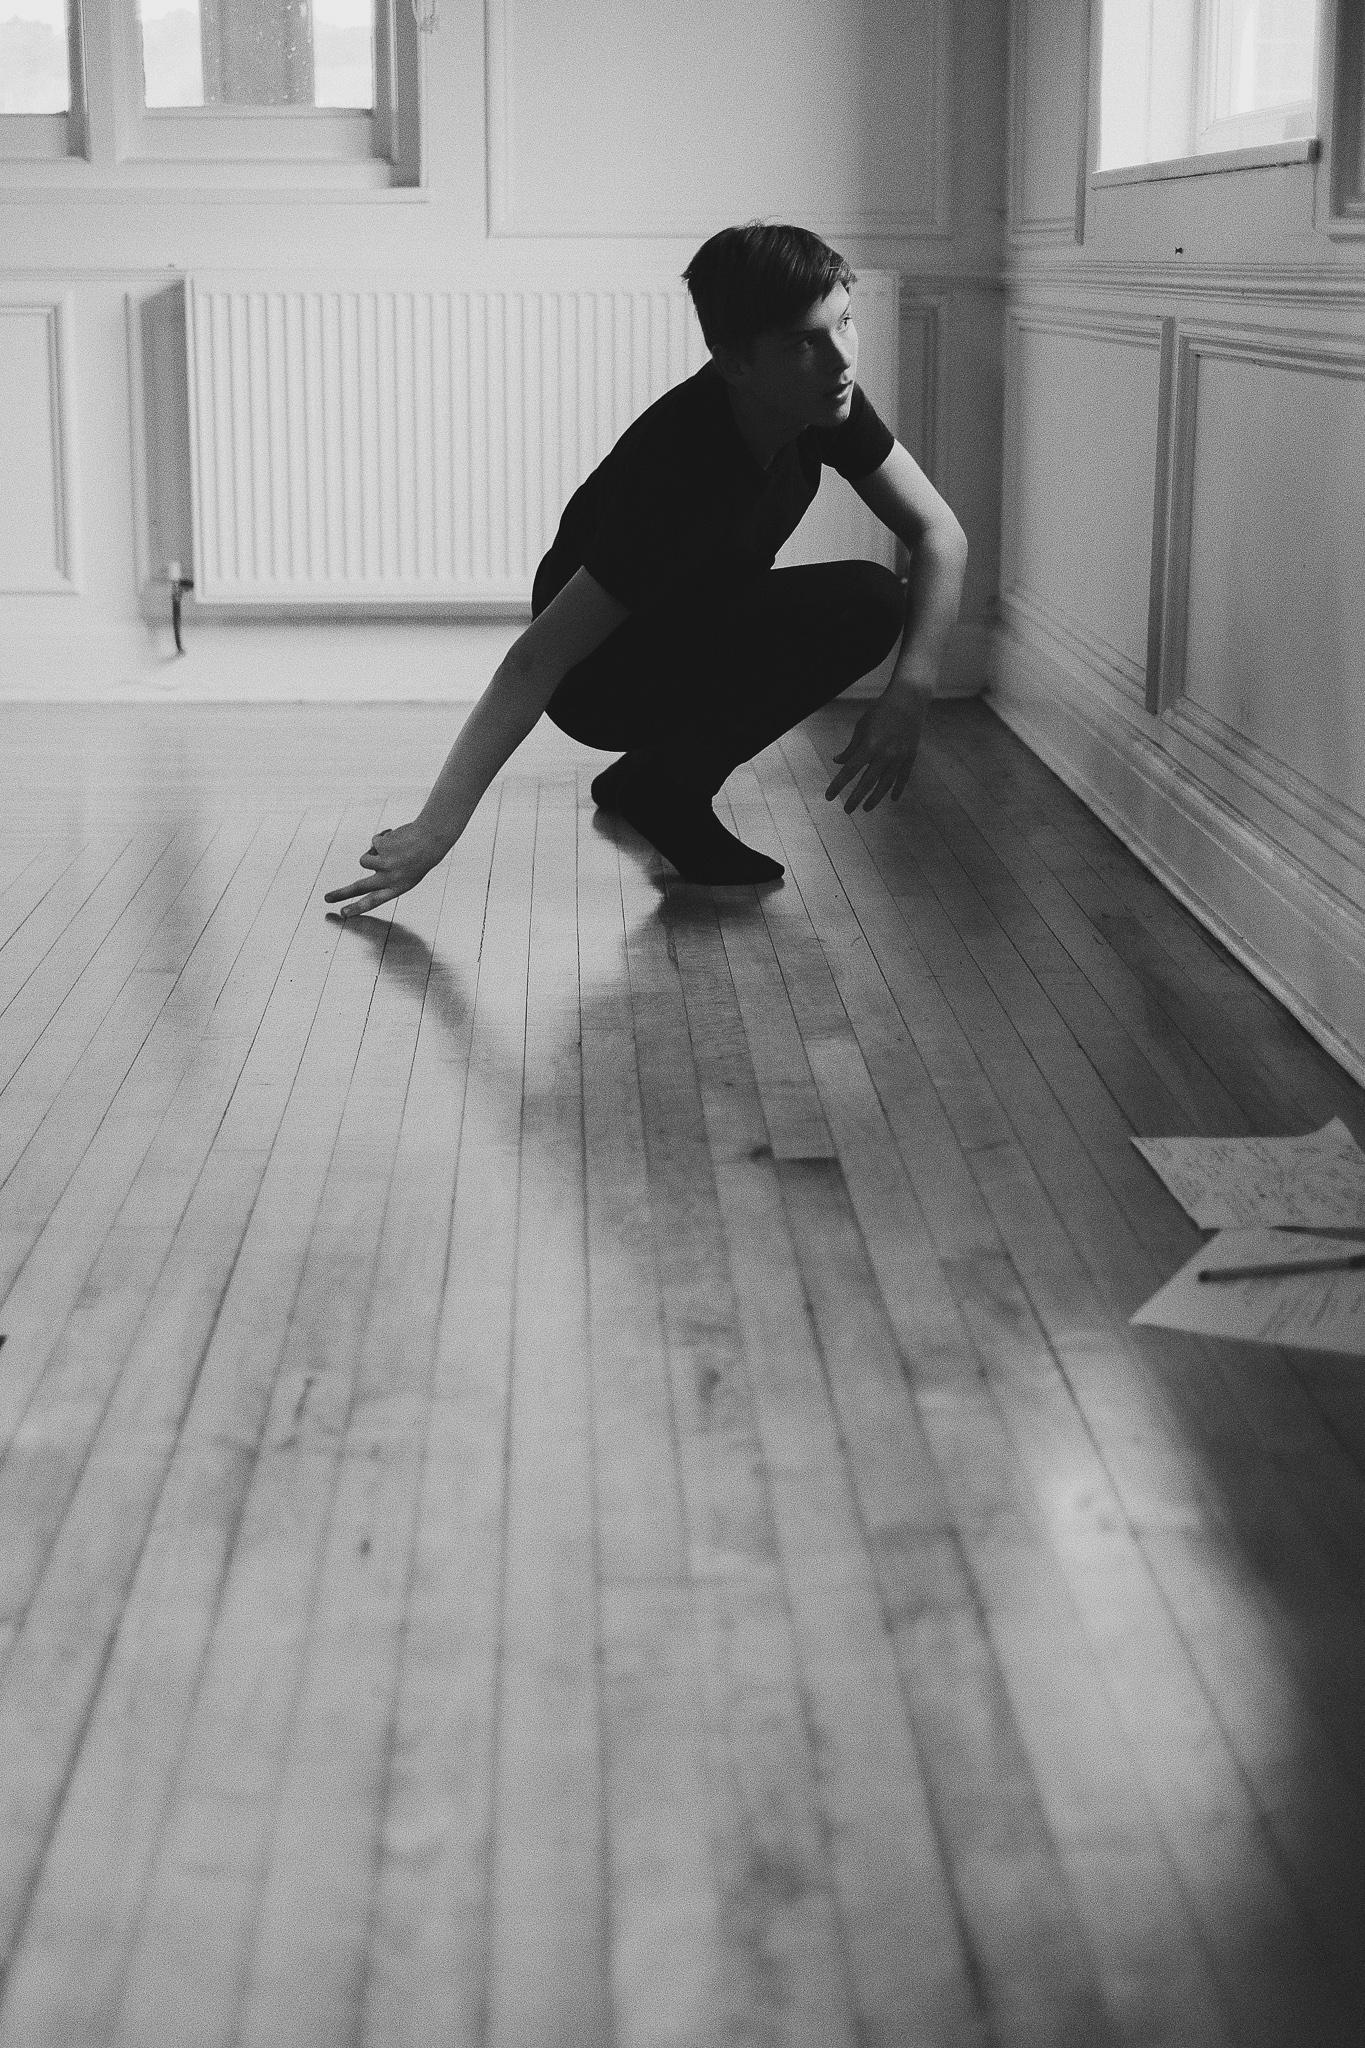 A teenage boy dances on the floor during a dance rehearsal